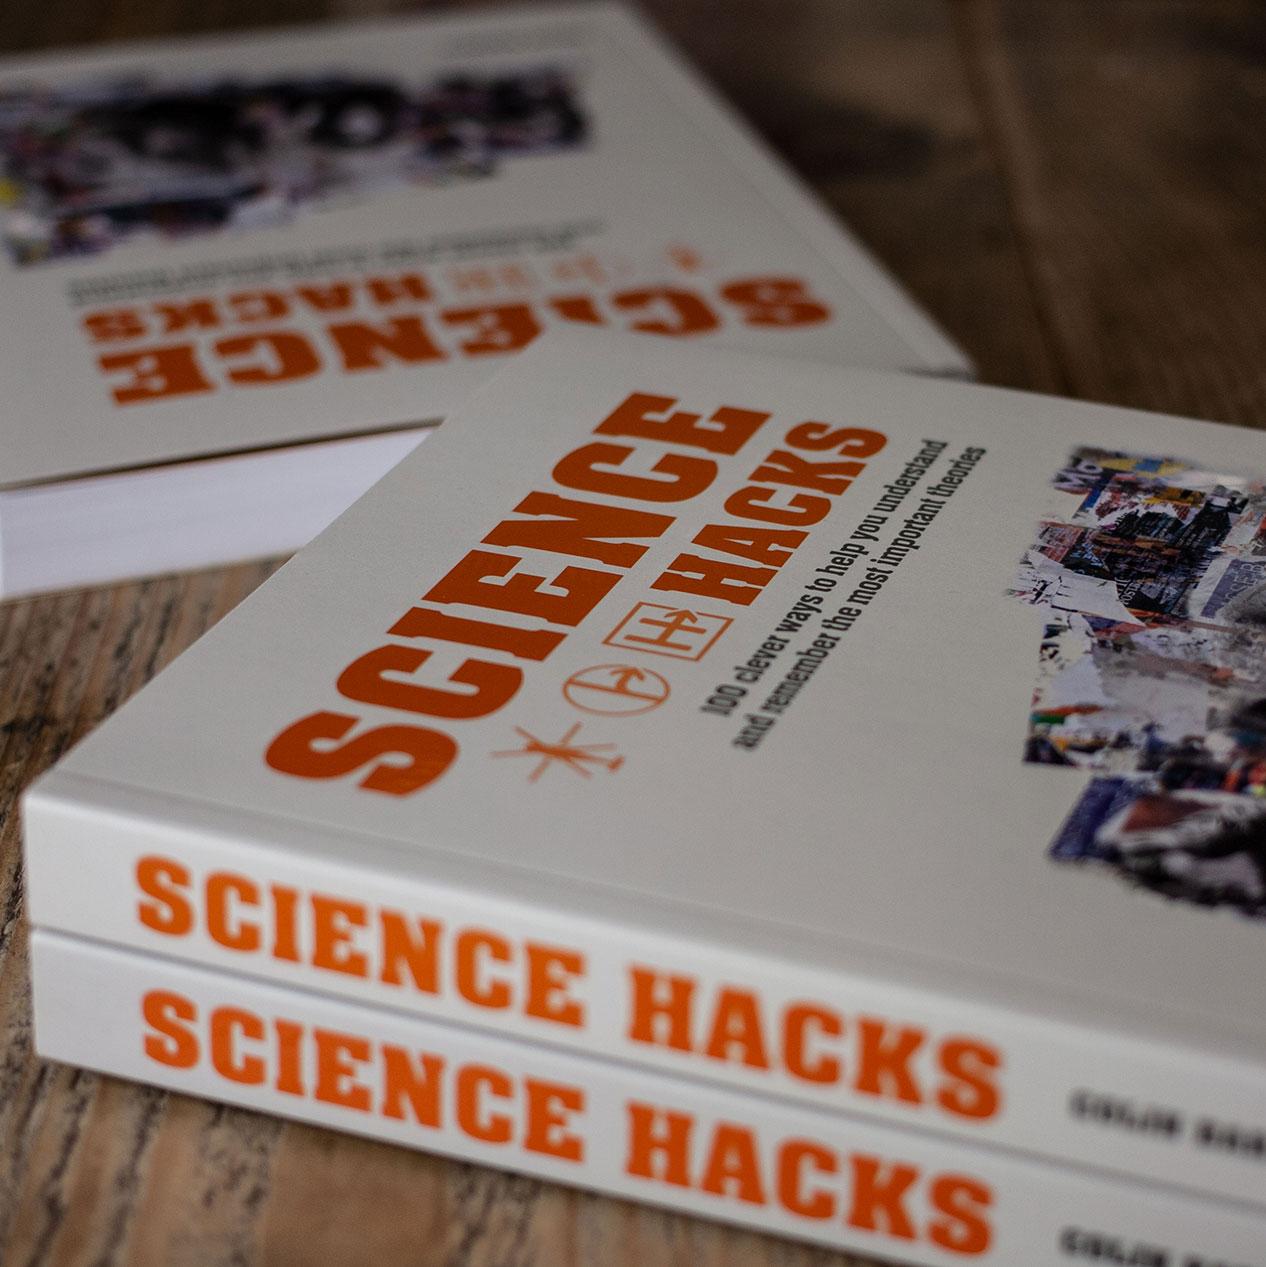 Science_Hacks_Cover_Sq